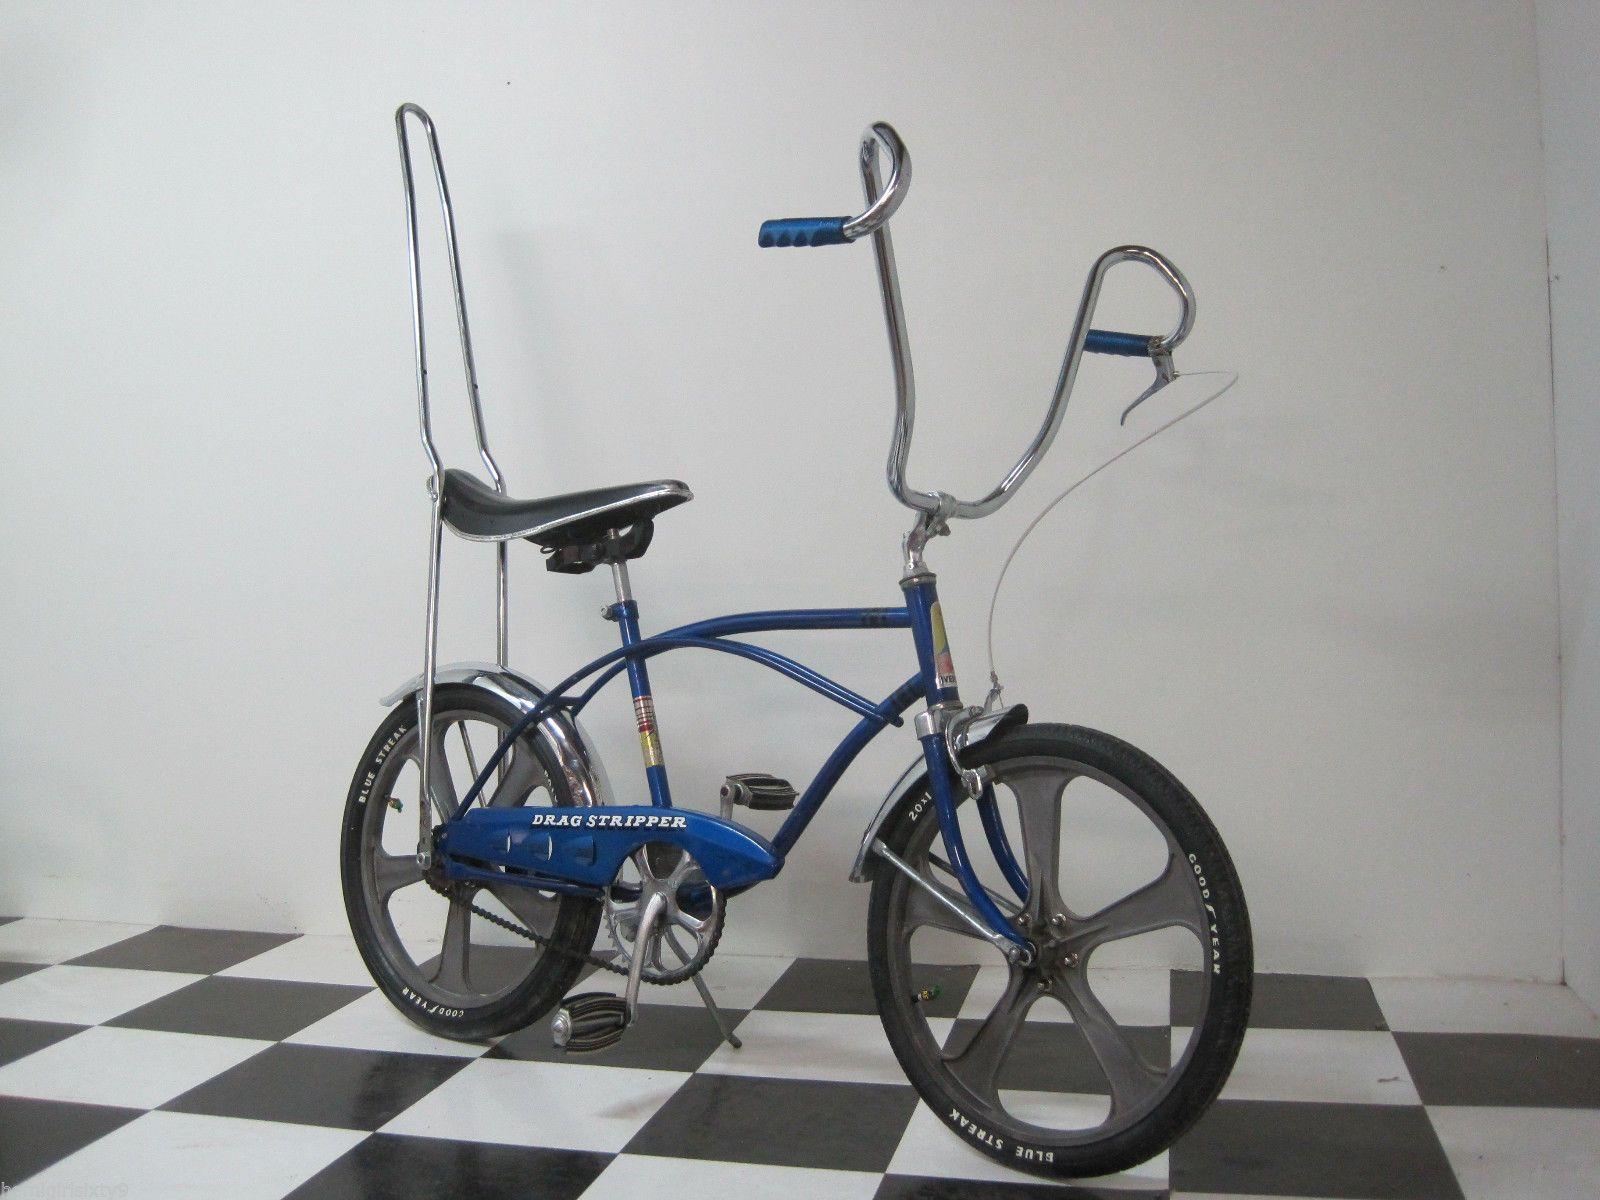 1969 George Barris Mag Iverson Drag Stripper Muscle Bike w Original ...